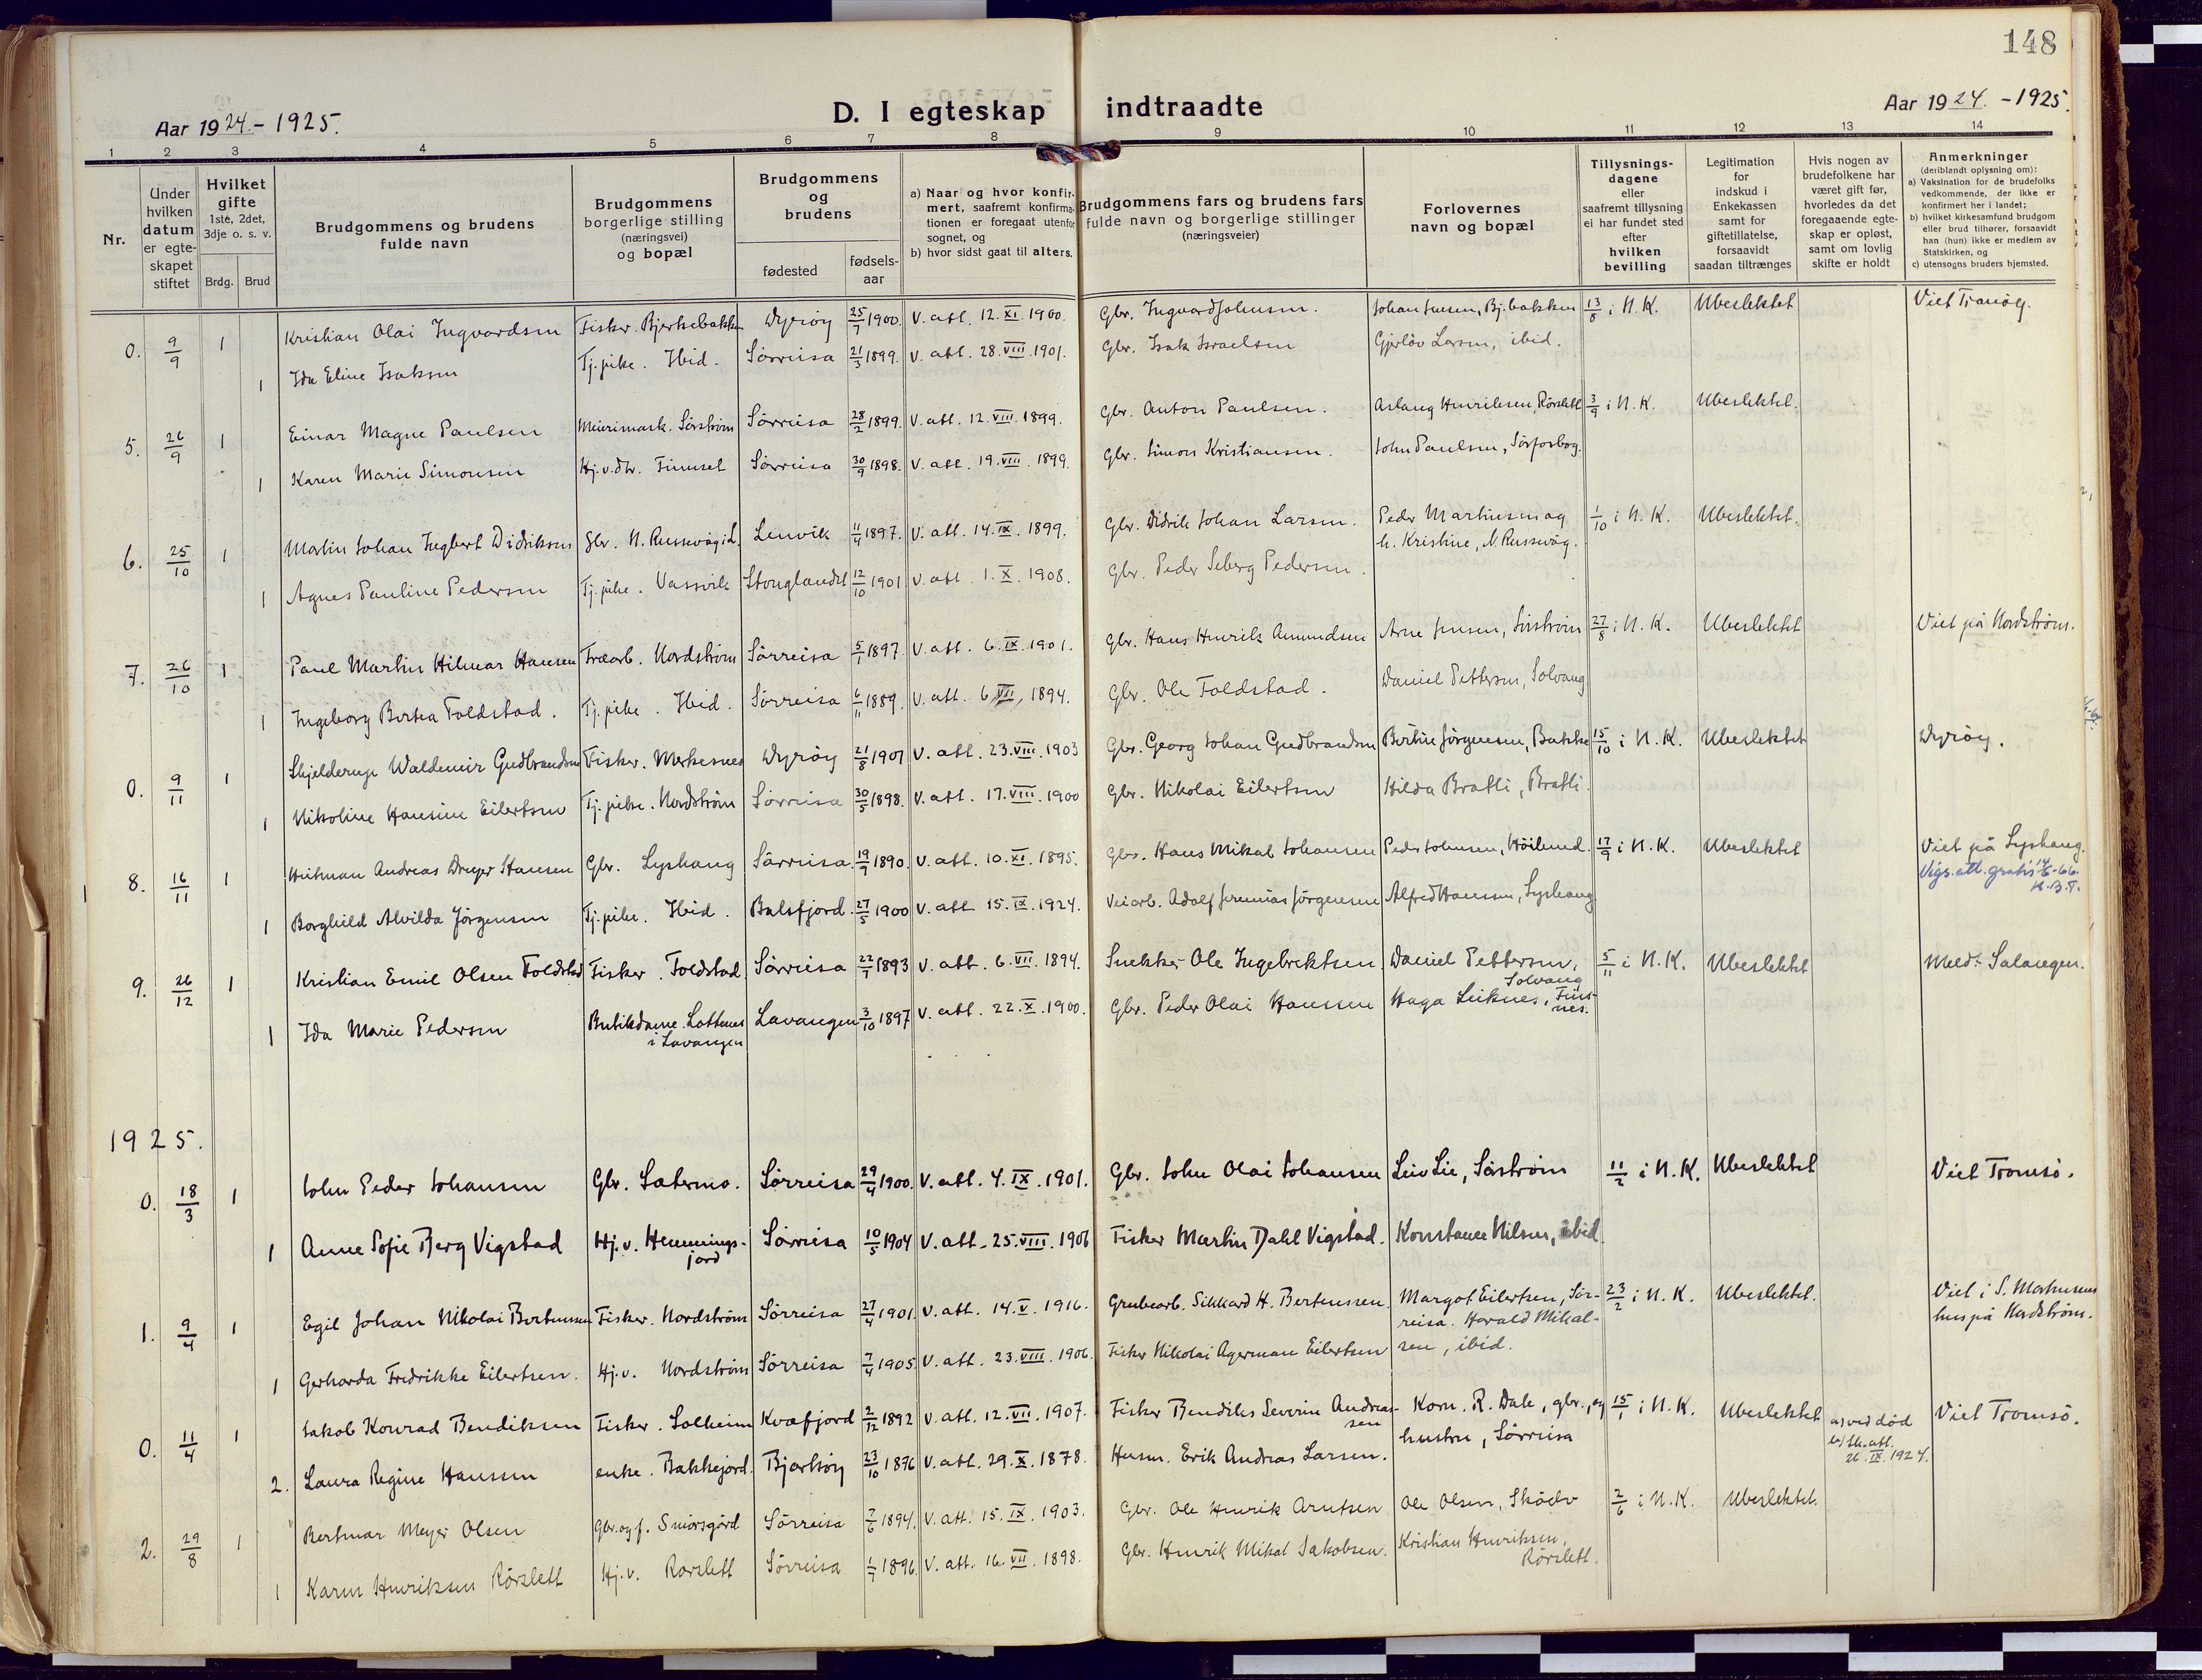 SATØ, Tranøy sokneprestkontor, I/Ia/Iaa/L0015kirke: Ministerialbok nr. 15, 1919-1928, s. 148